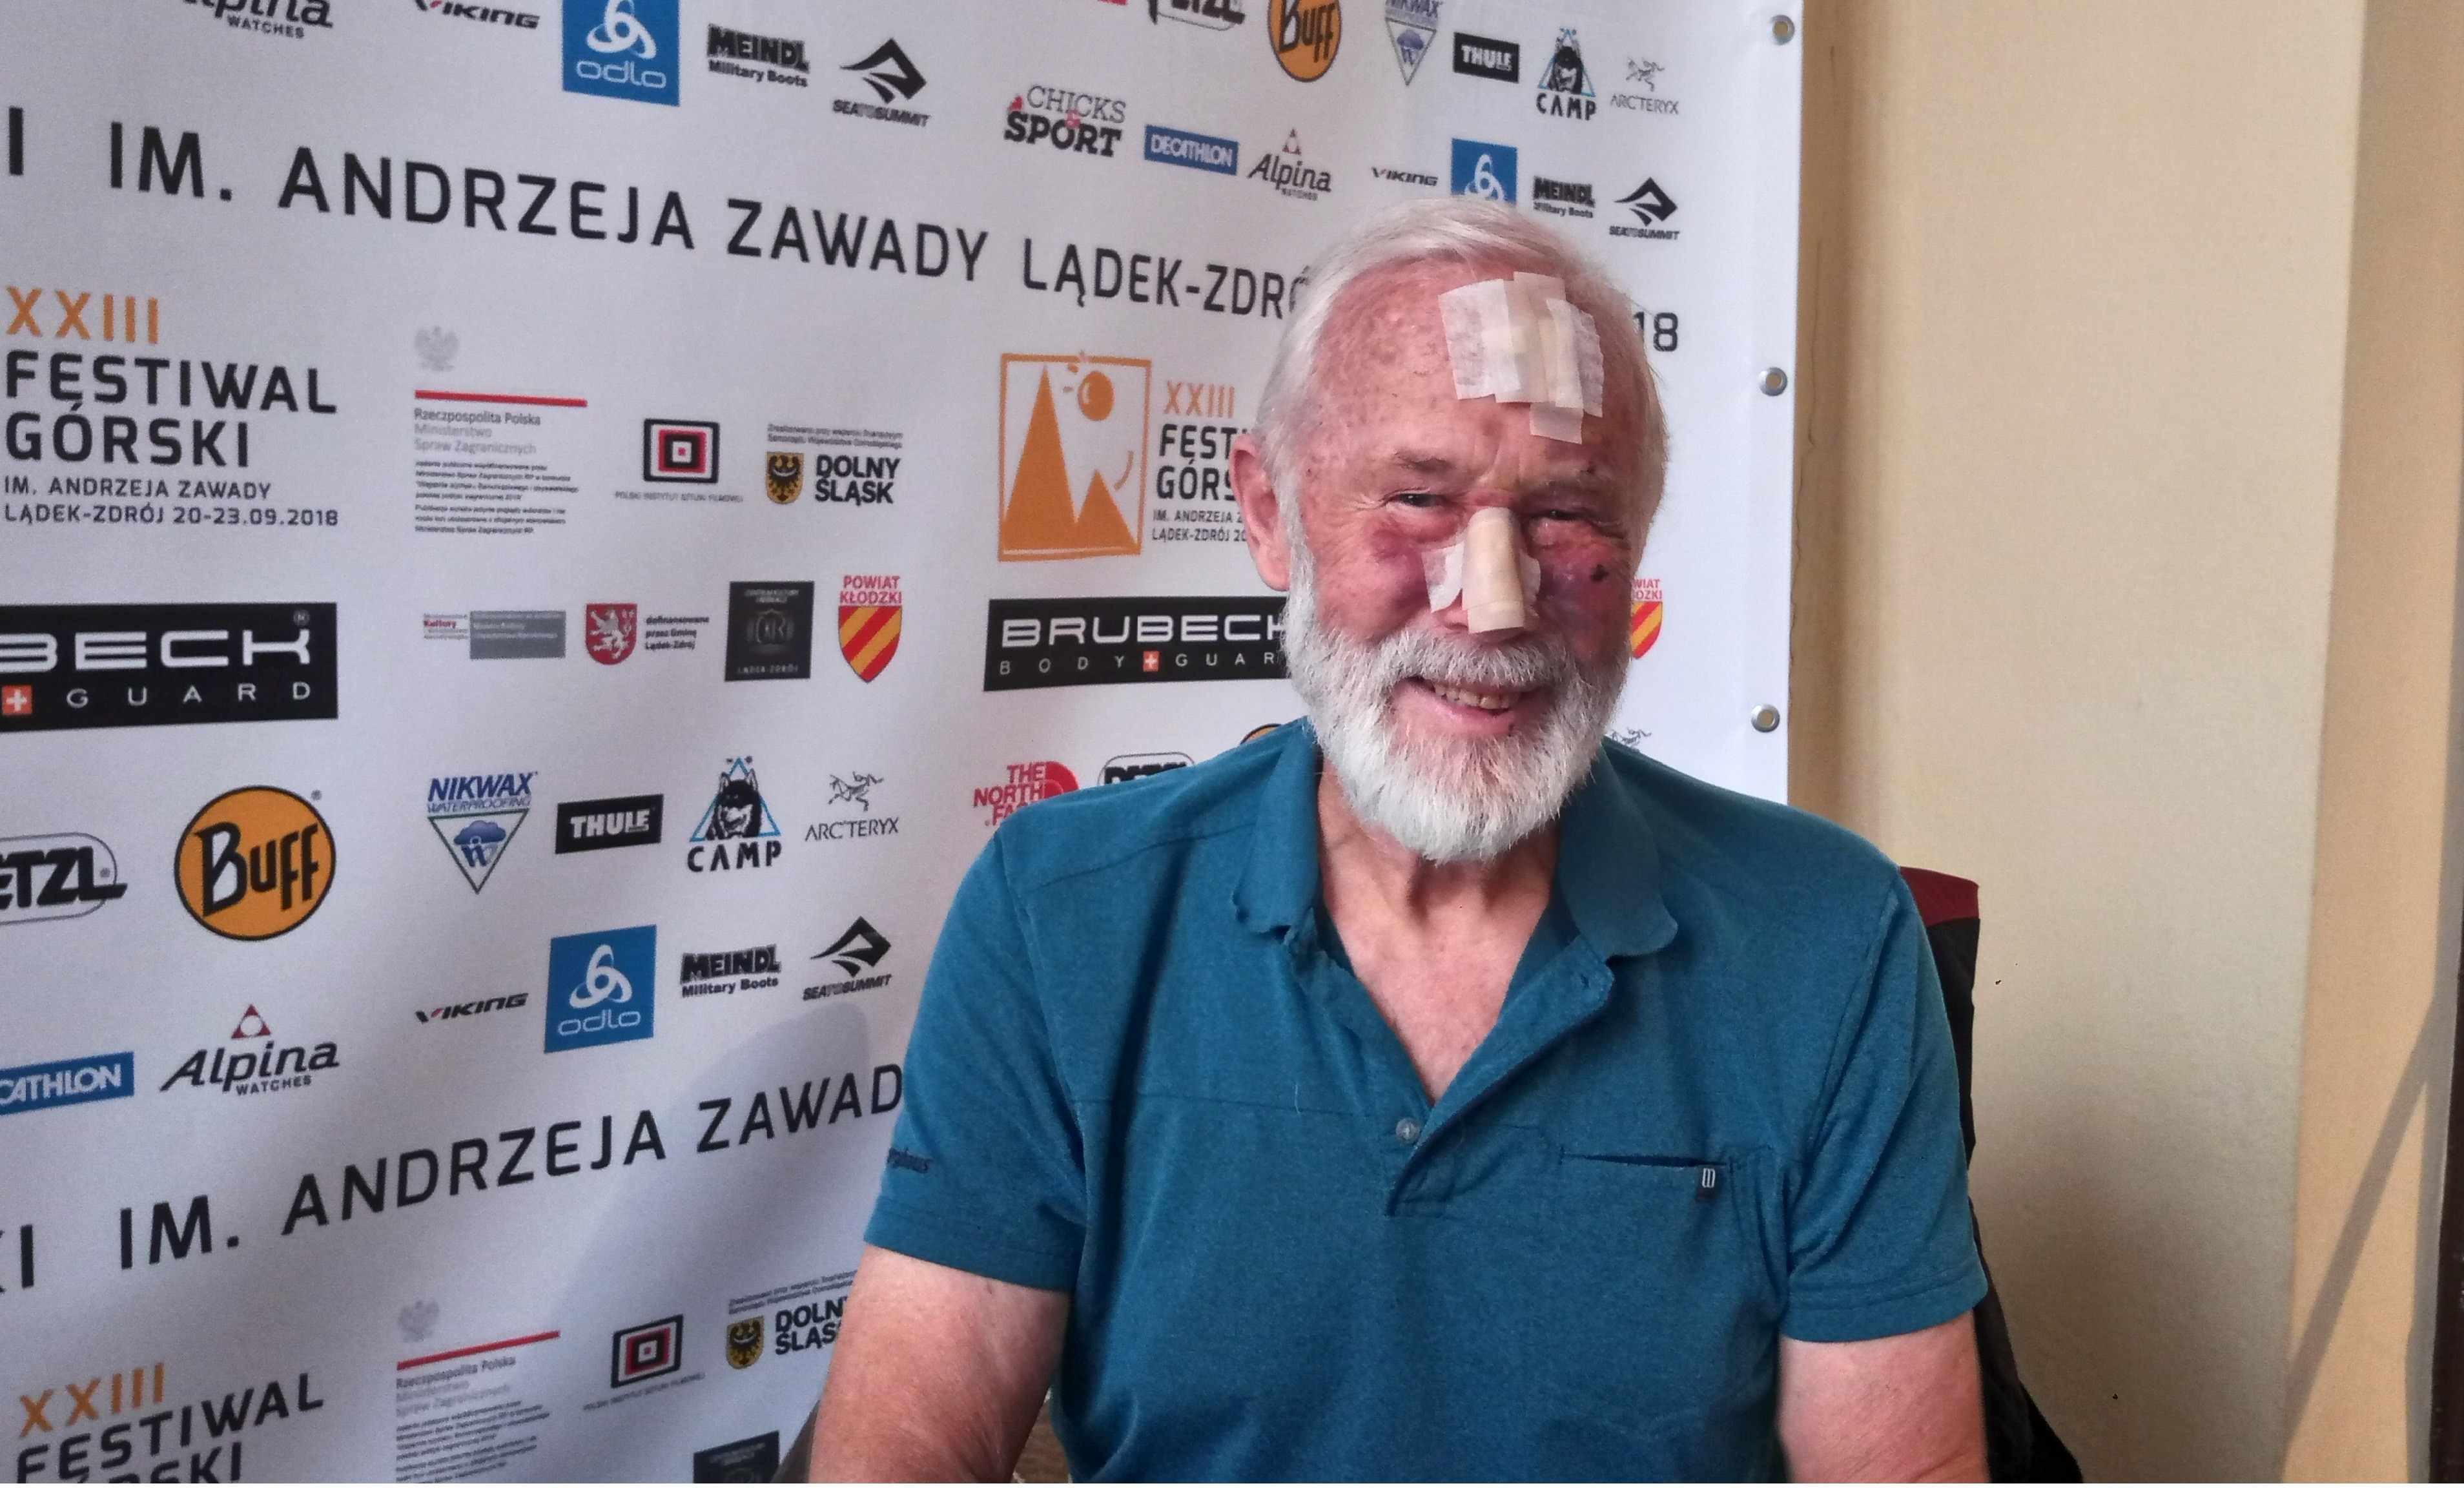 Sir Chris Bonington, Ladek Mountain Festival